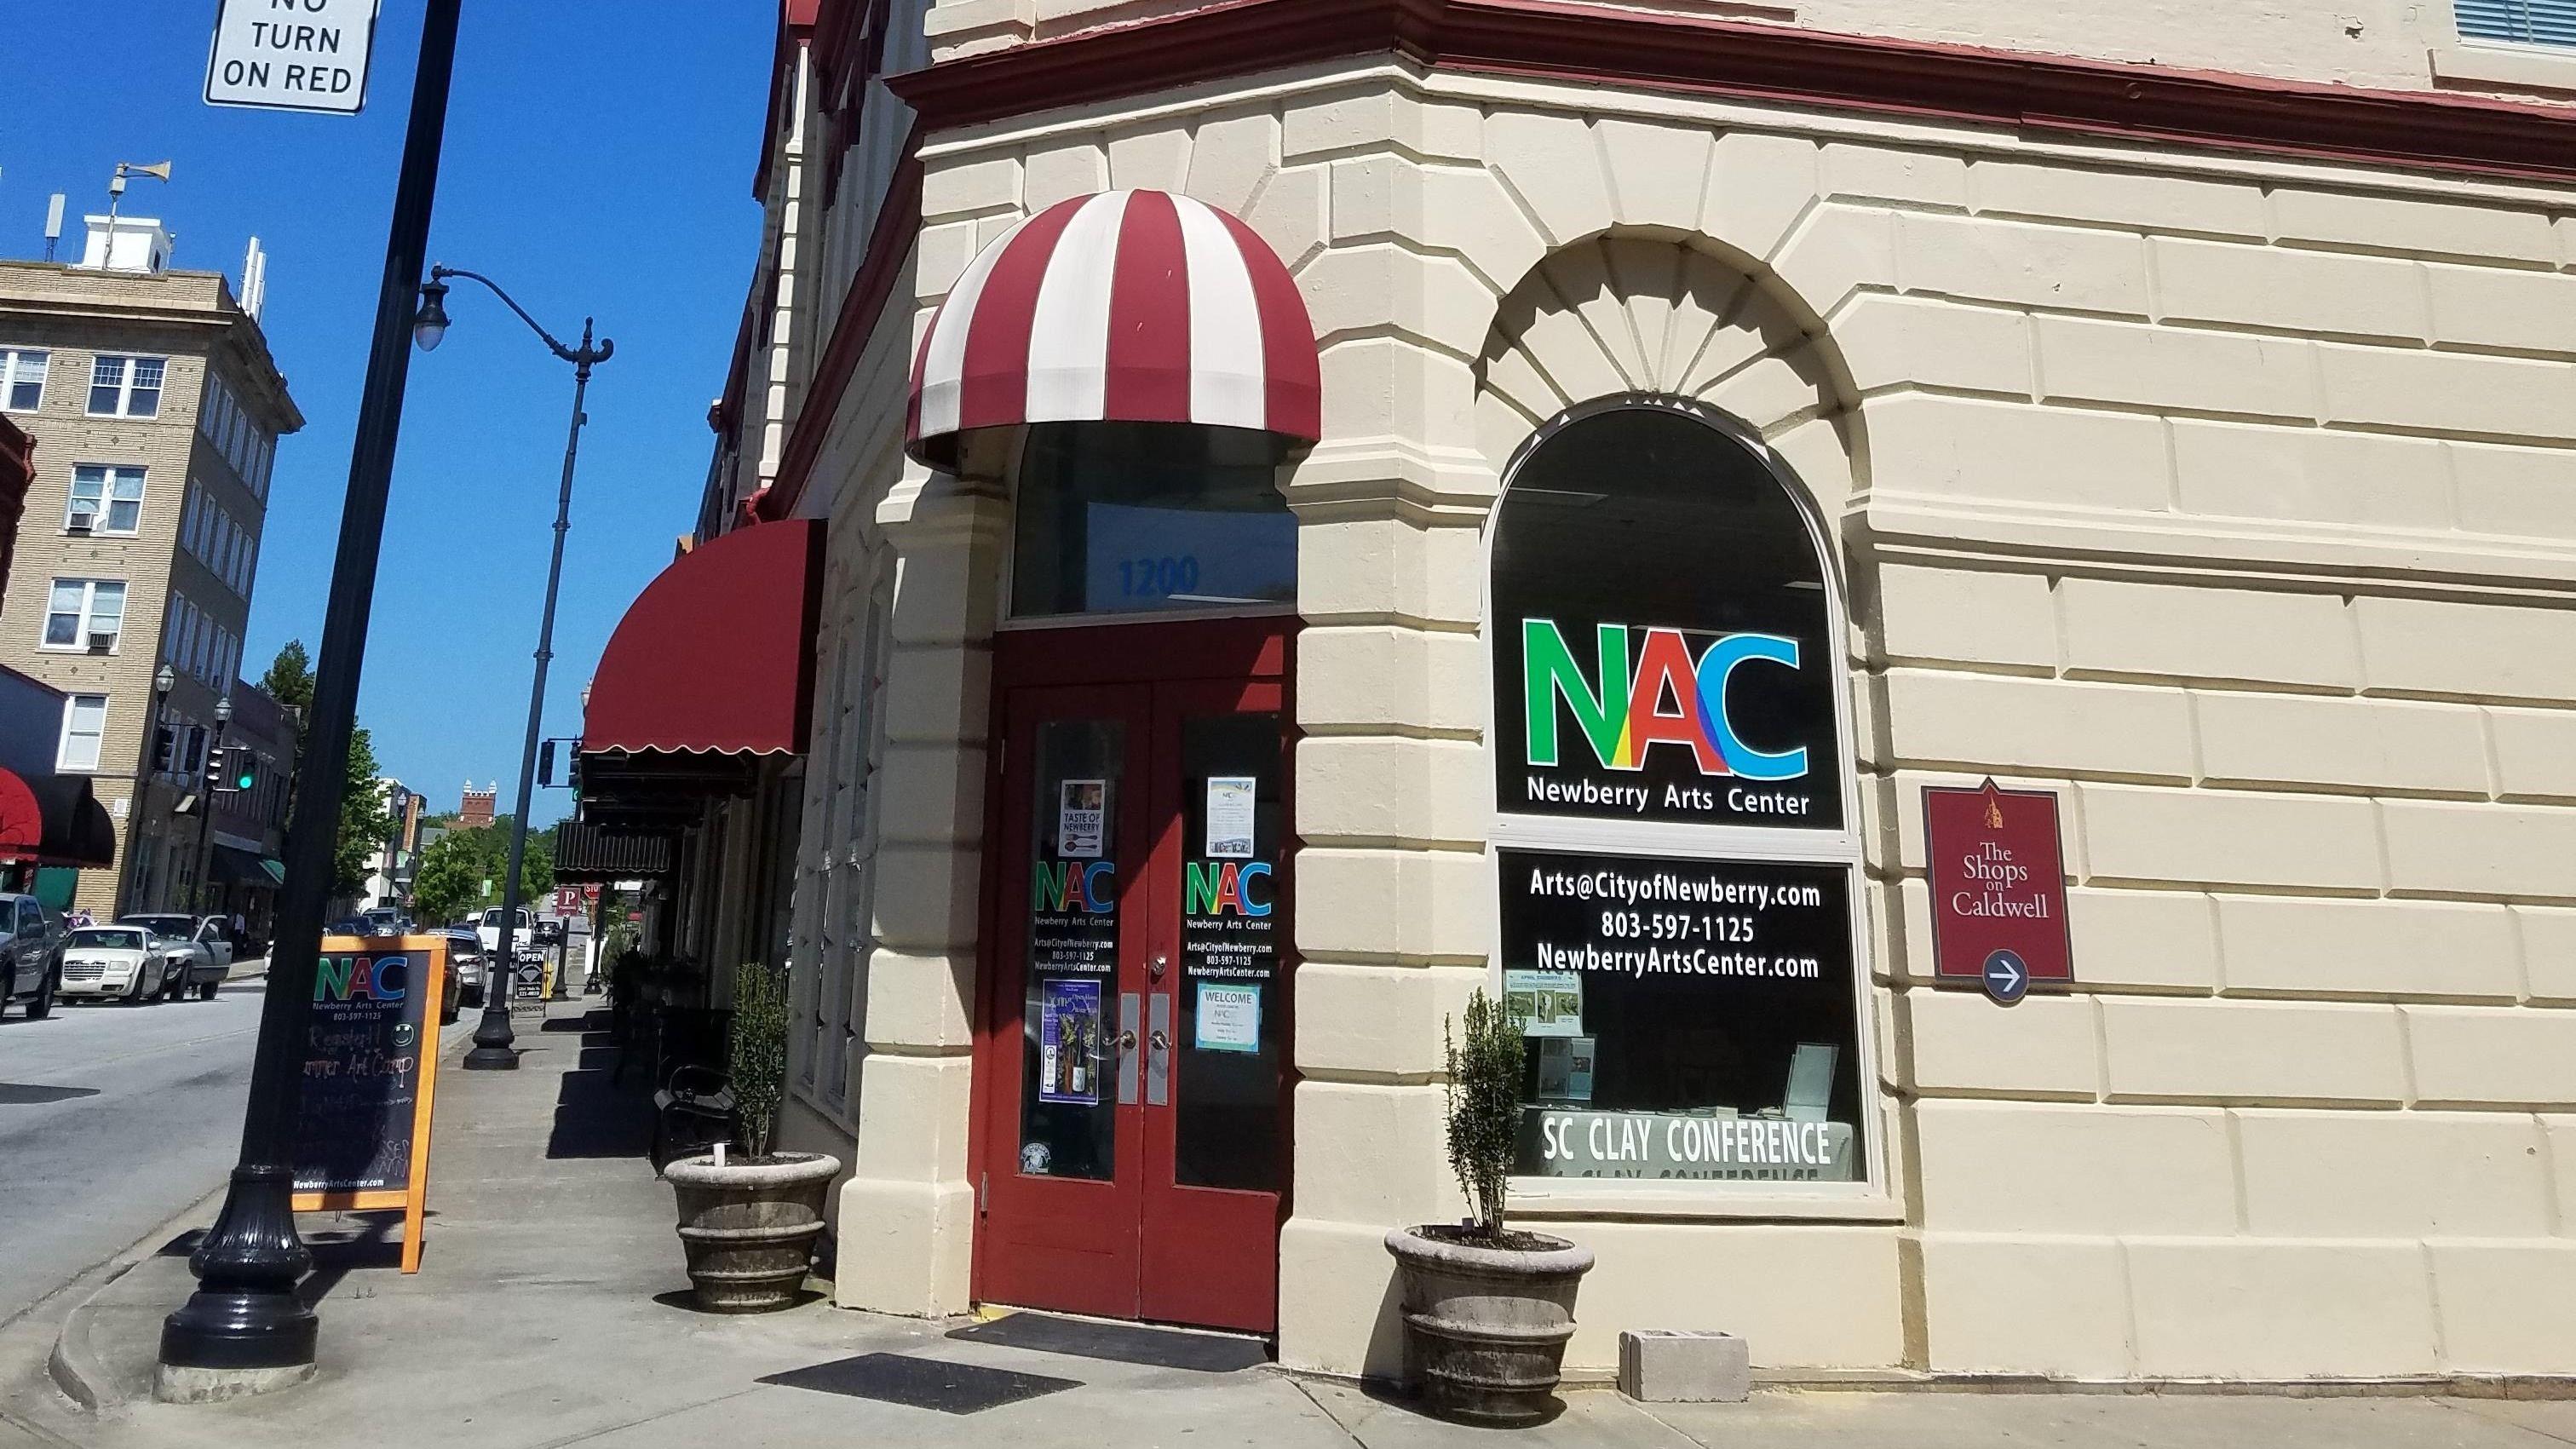 Newberry Arts Center